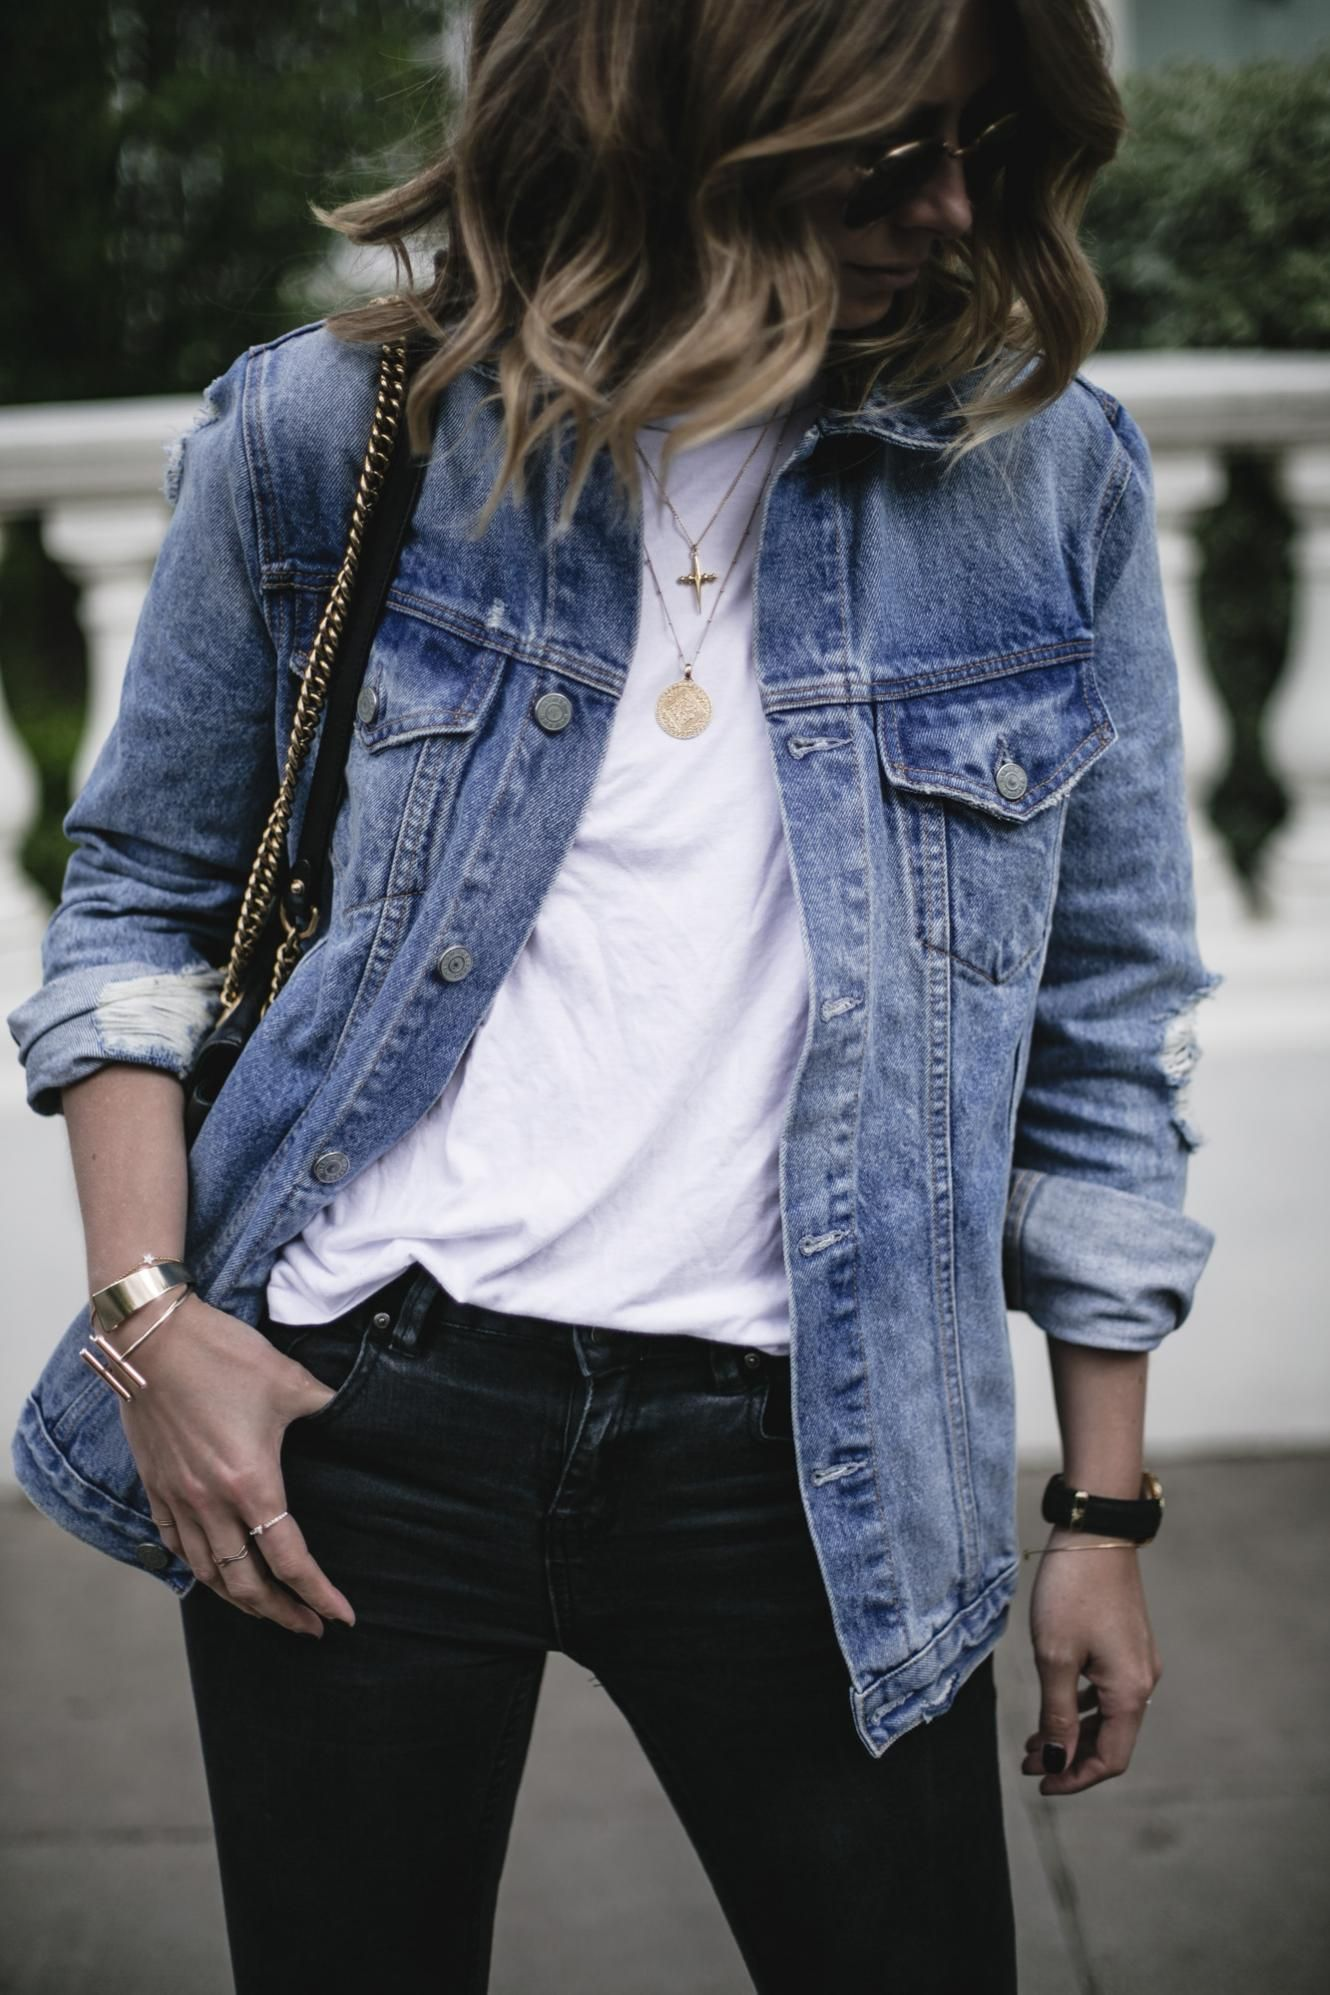 Emma Hill Wears Grlfrnd Oversized Denim Jacket White T Shirt Black Skinny Jeans Gold Jewellery Oversized Denim Jacket Denim Jacket Blue Denim Jacket Outfit